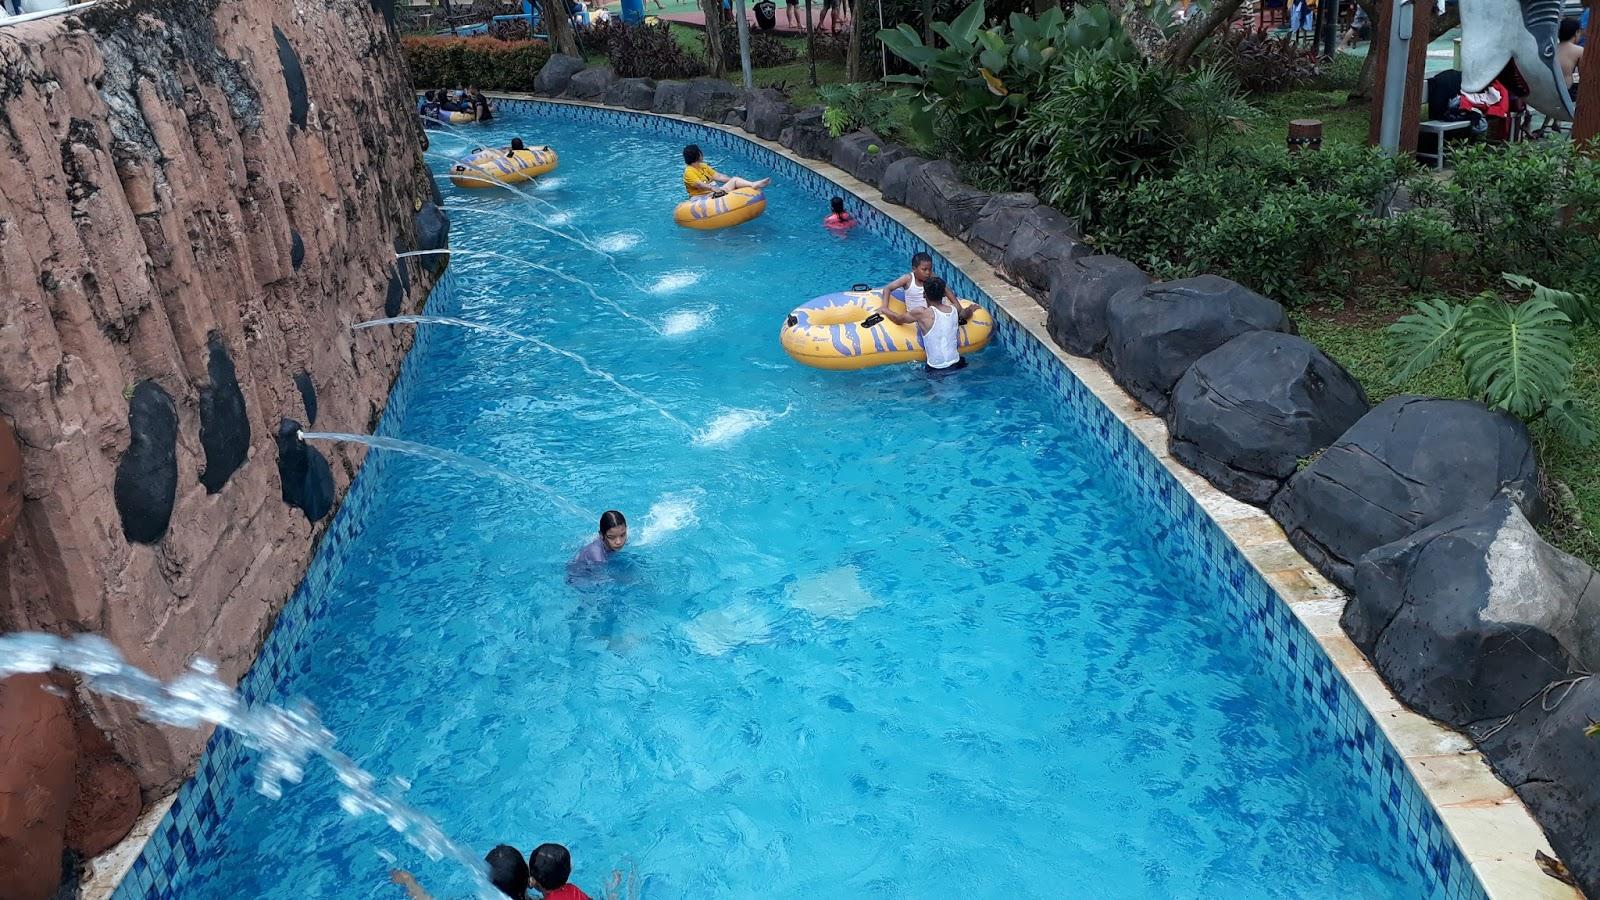 Kornelius Ginting Have Fun Go Wet Ocean Park Bsd Tiket Refleksi Air Mancur